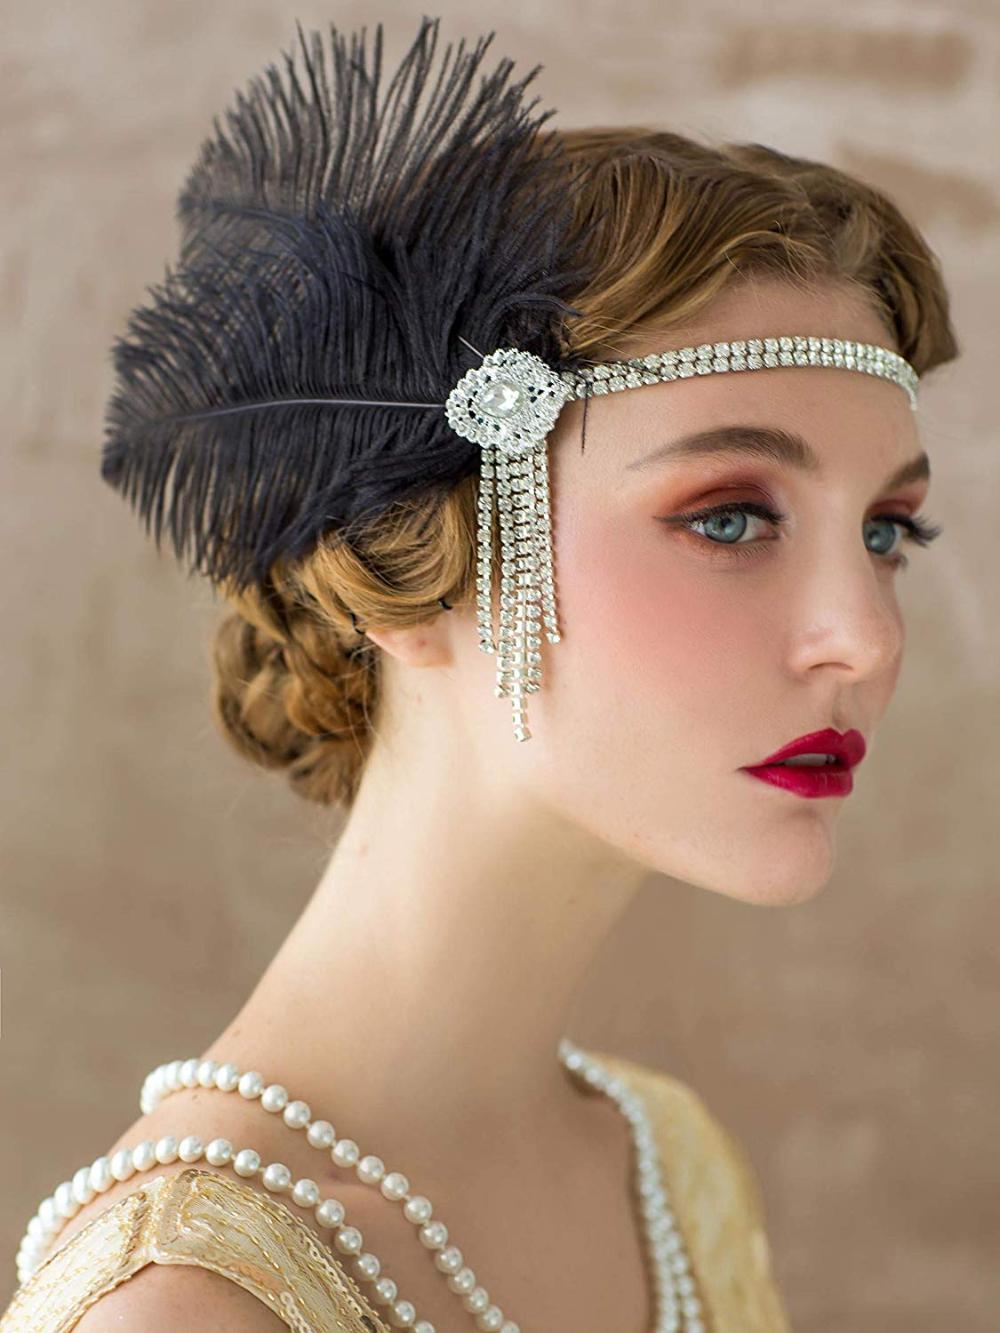 1920s Headband, Headpiece & Hair Accessory Styles ...